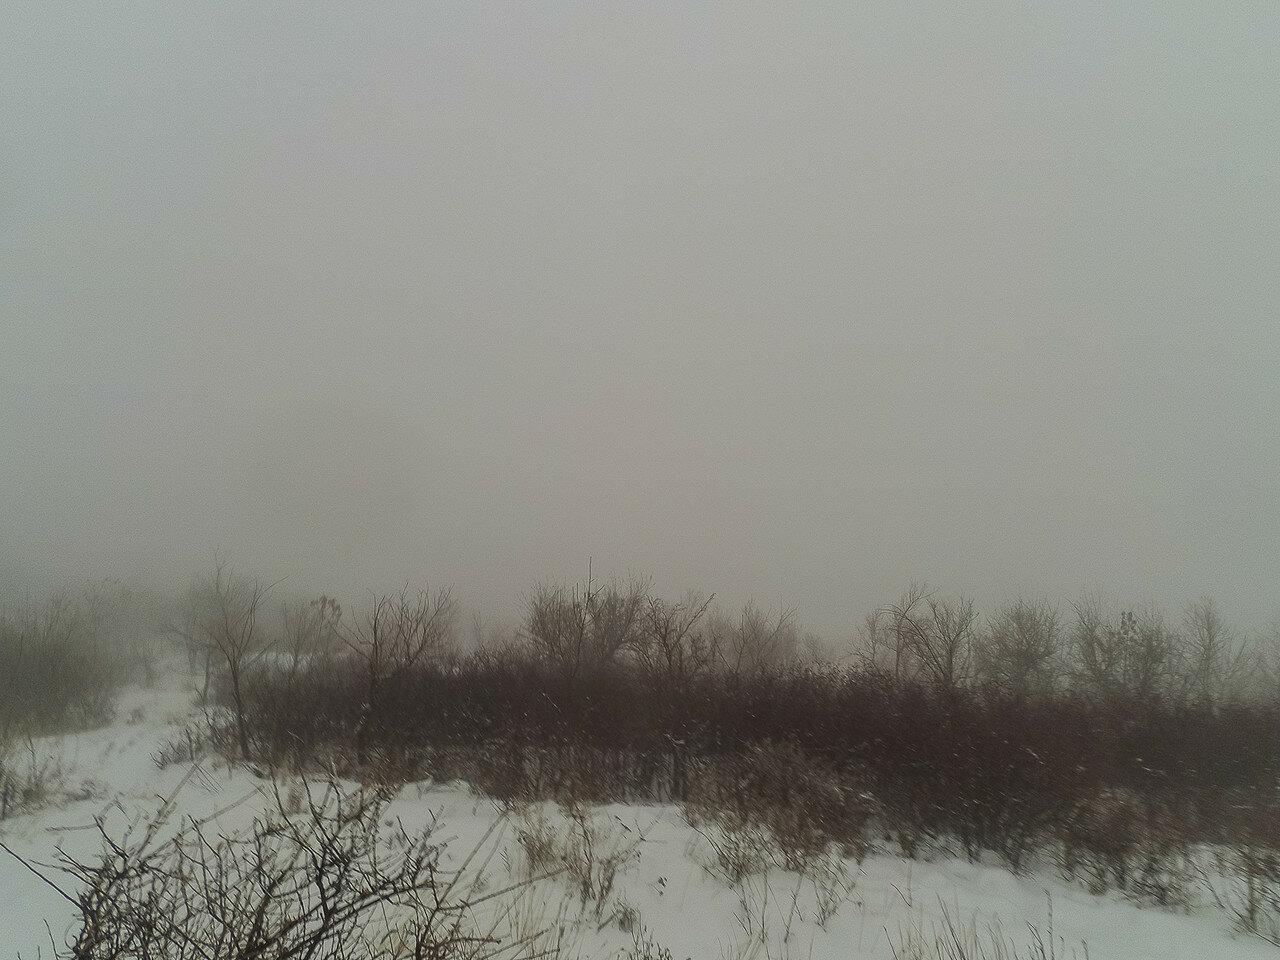 Туманные перспективы фото 5